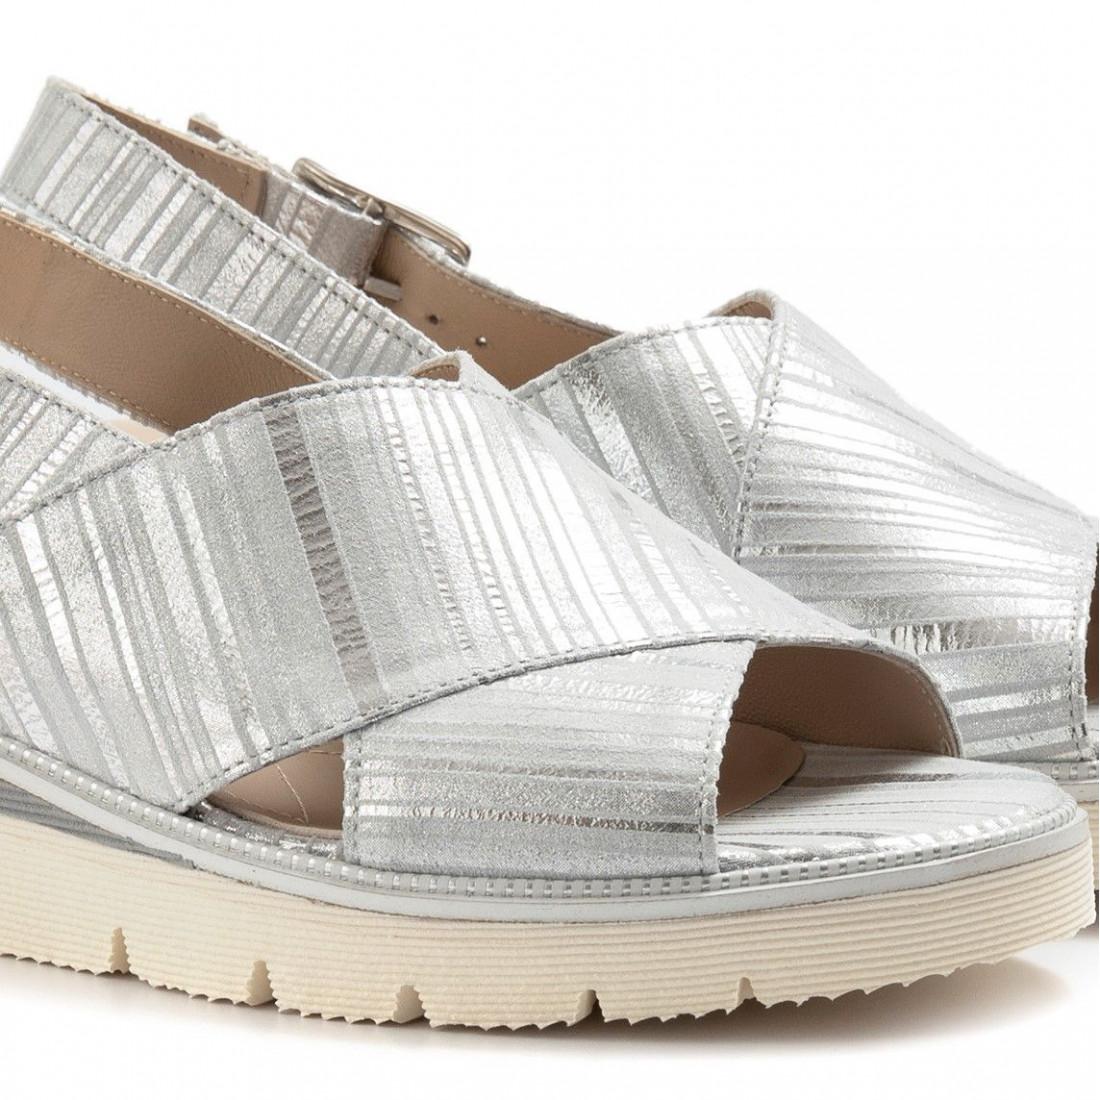 sandals woman sangiorgio 070212 argento 7052